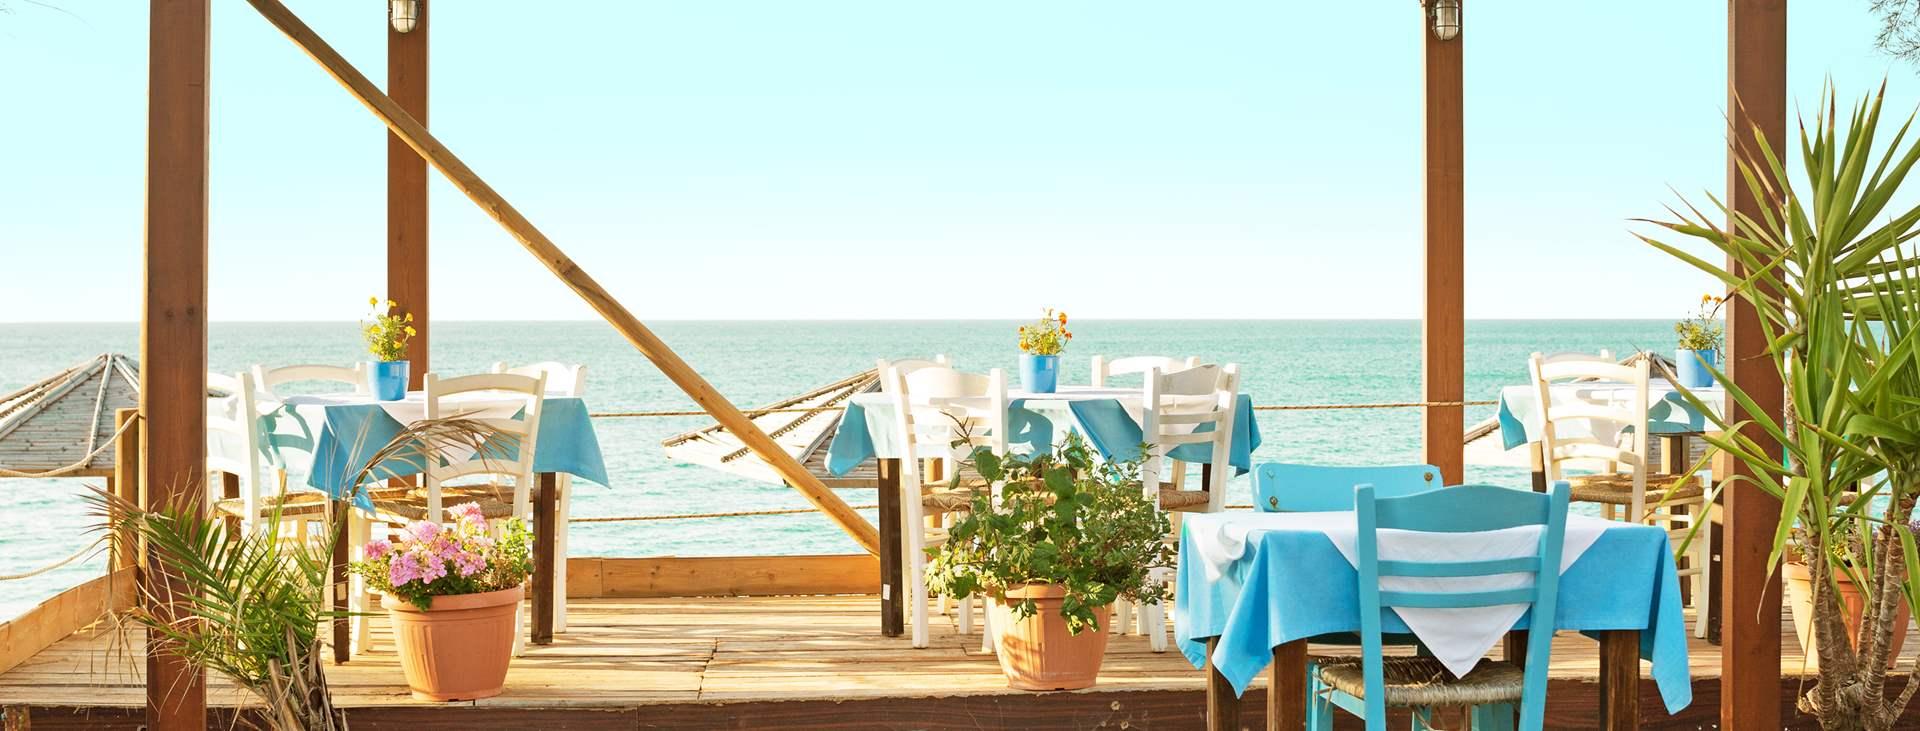 Boka din resa till Maleme i Grekland med Ving